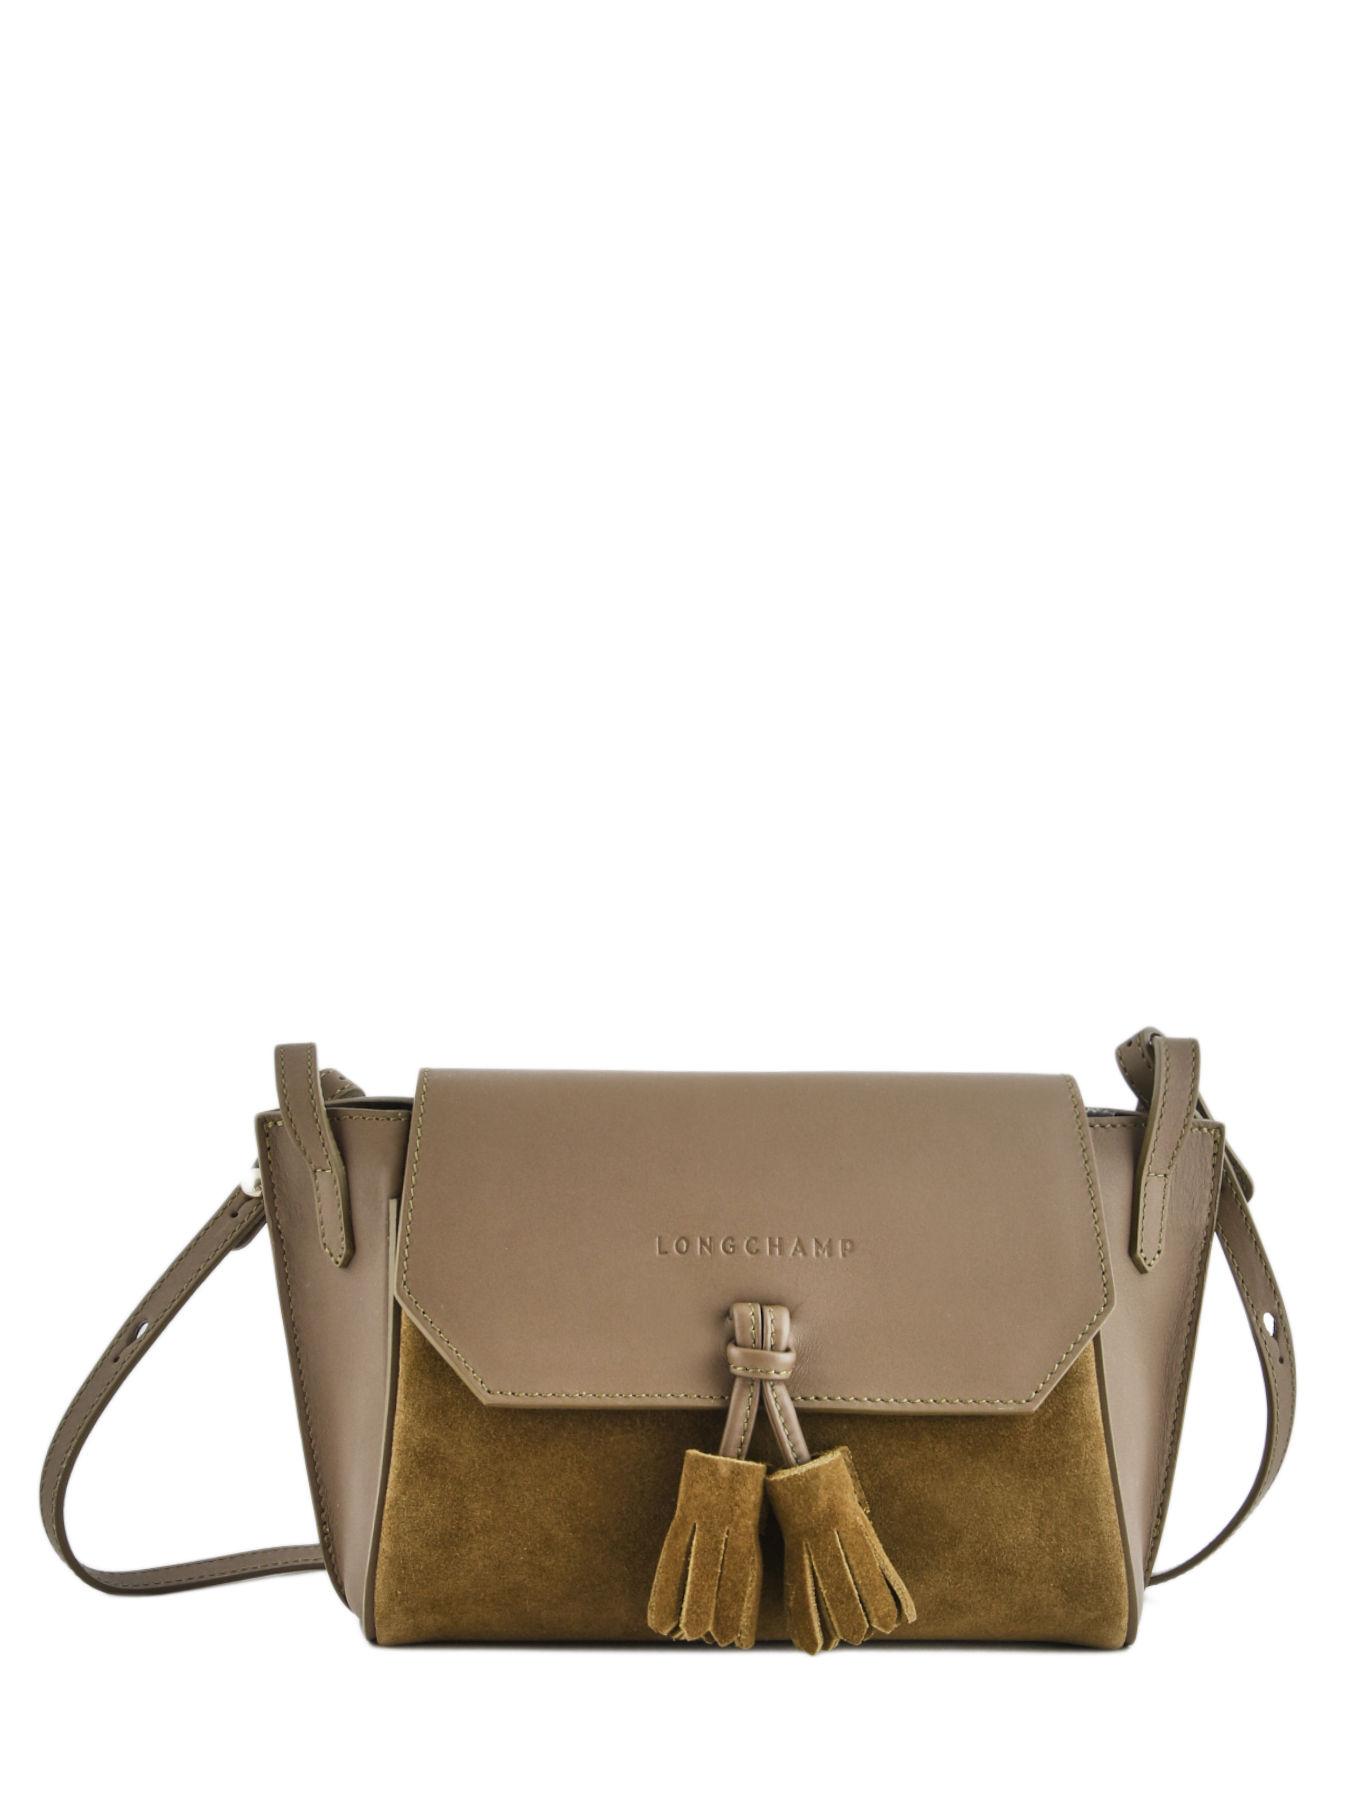 f23921e065 Longchamp Messenger bag 2066861 - free shipping available